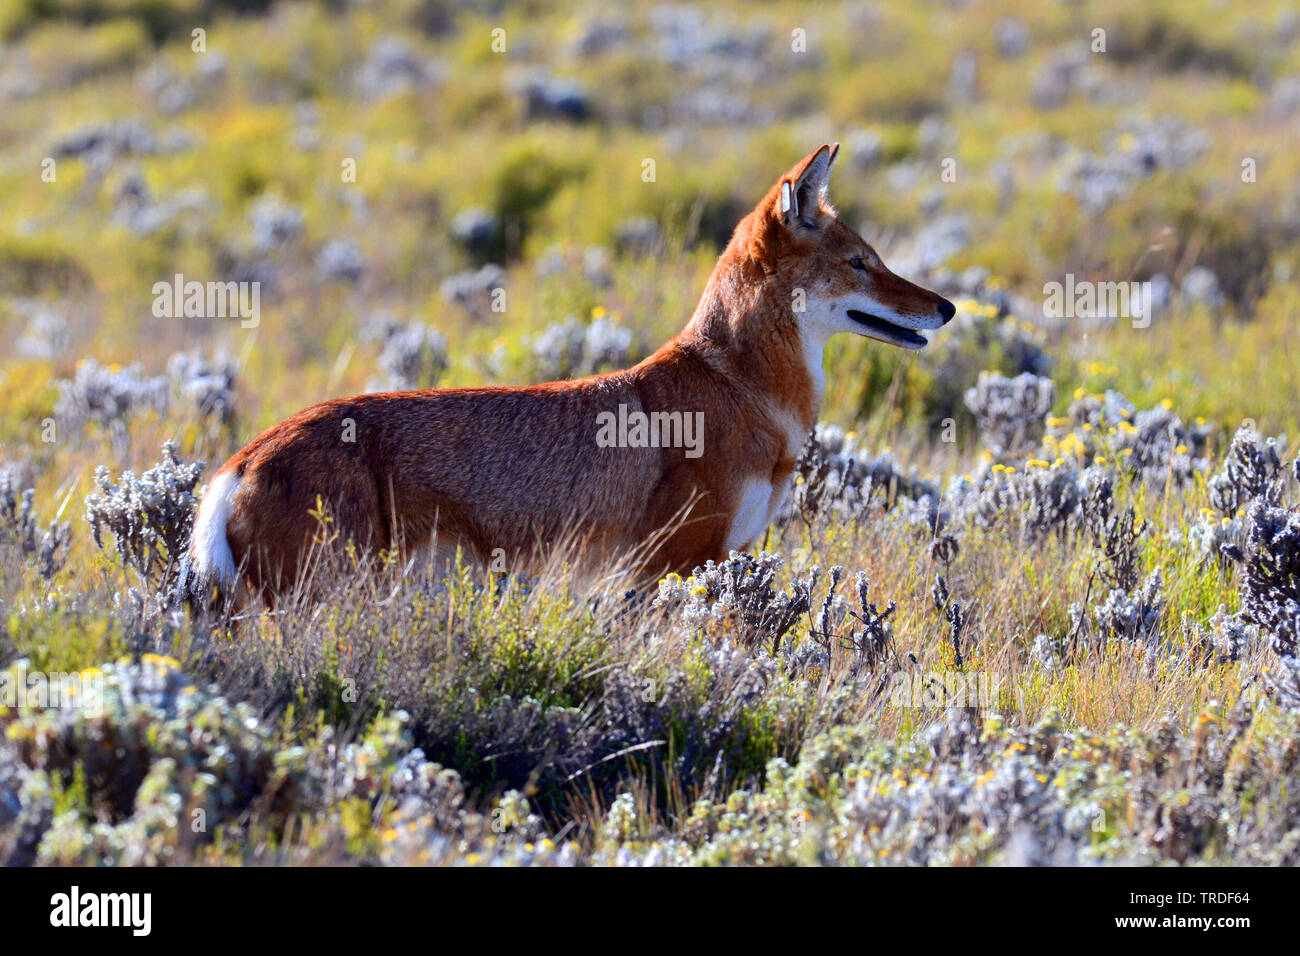 Simien jackal, Ethiopian wolf, Simien fox (Canis simensis), an endangered predator endemic to the Ethiopian Highlands., Ethiopia, Bale Mountains National Park Stock Photo